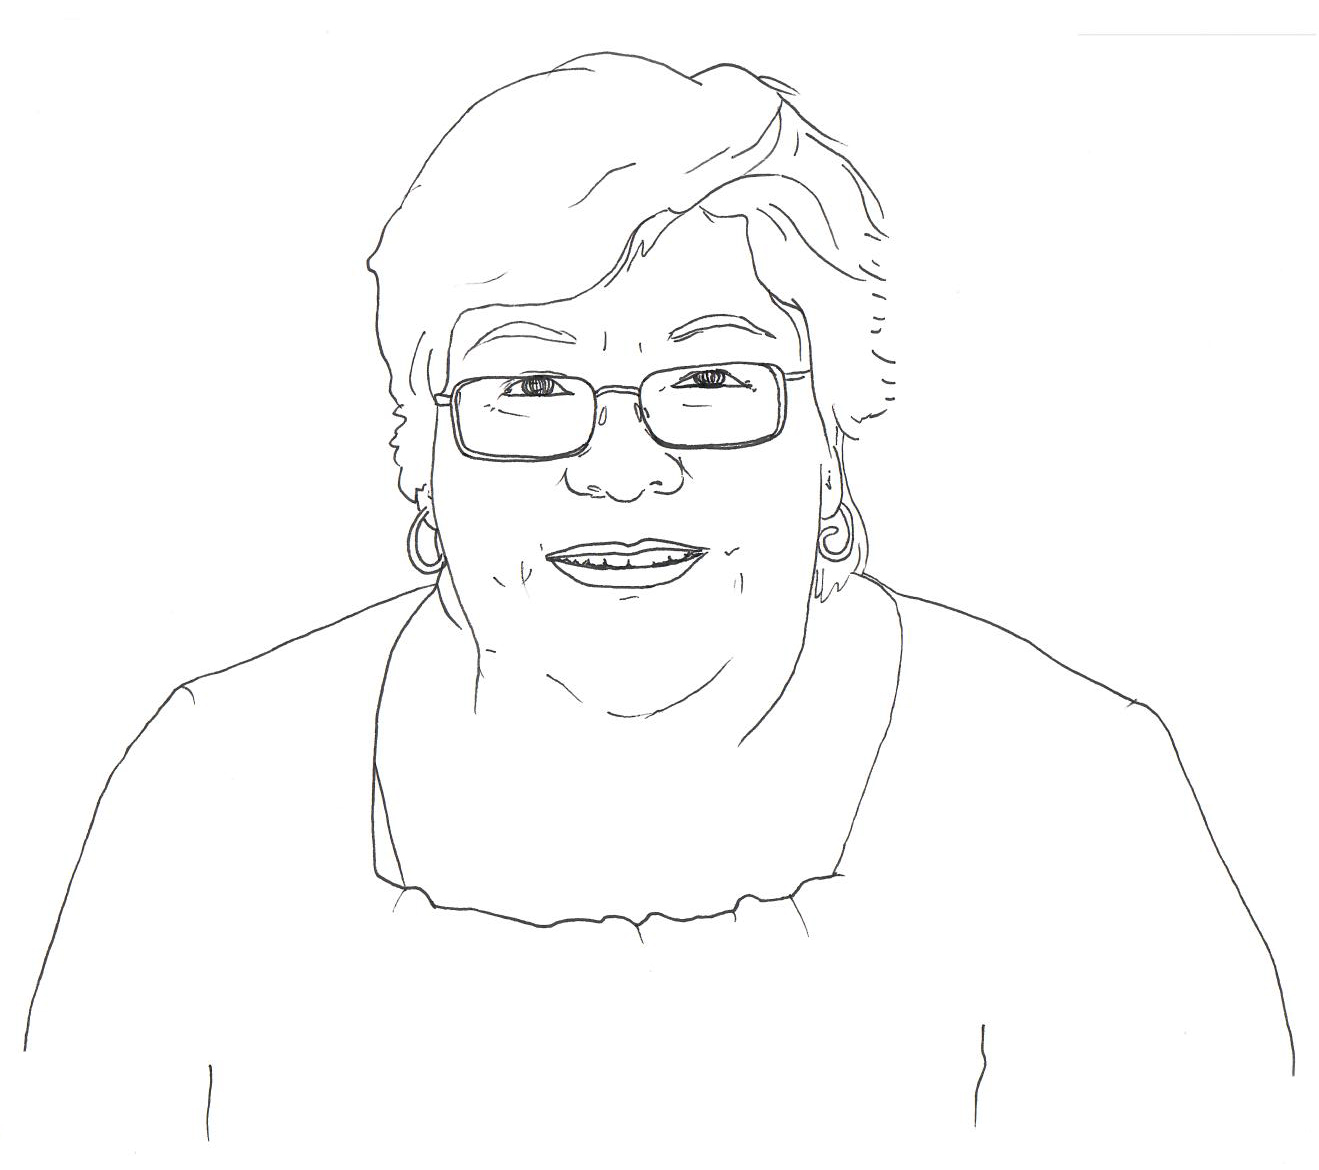 Lithuania Denetso, Researcher